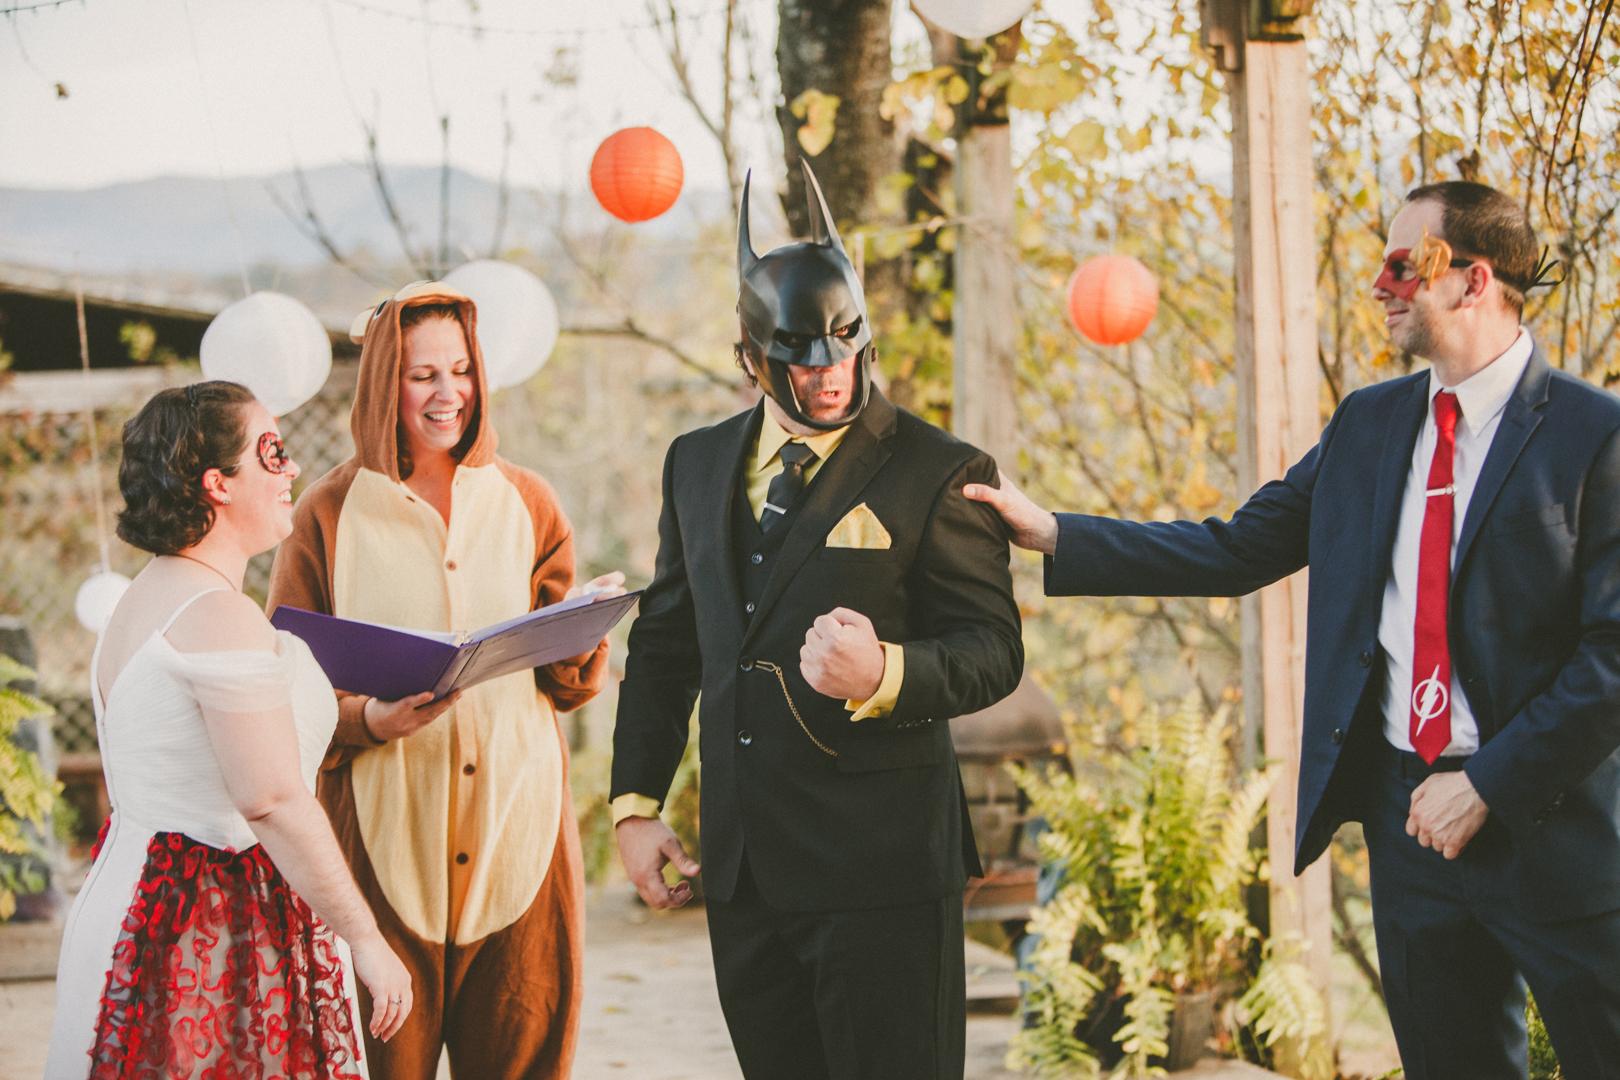 Mike&Hannah_HalloweenWedding-24.jpg